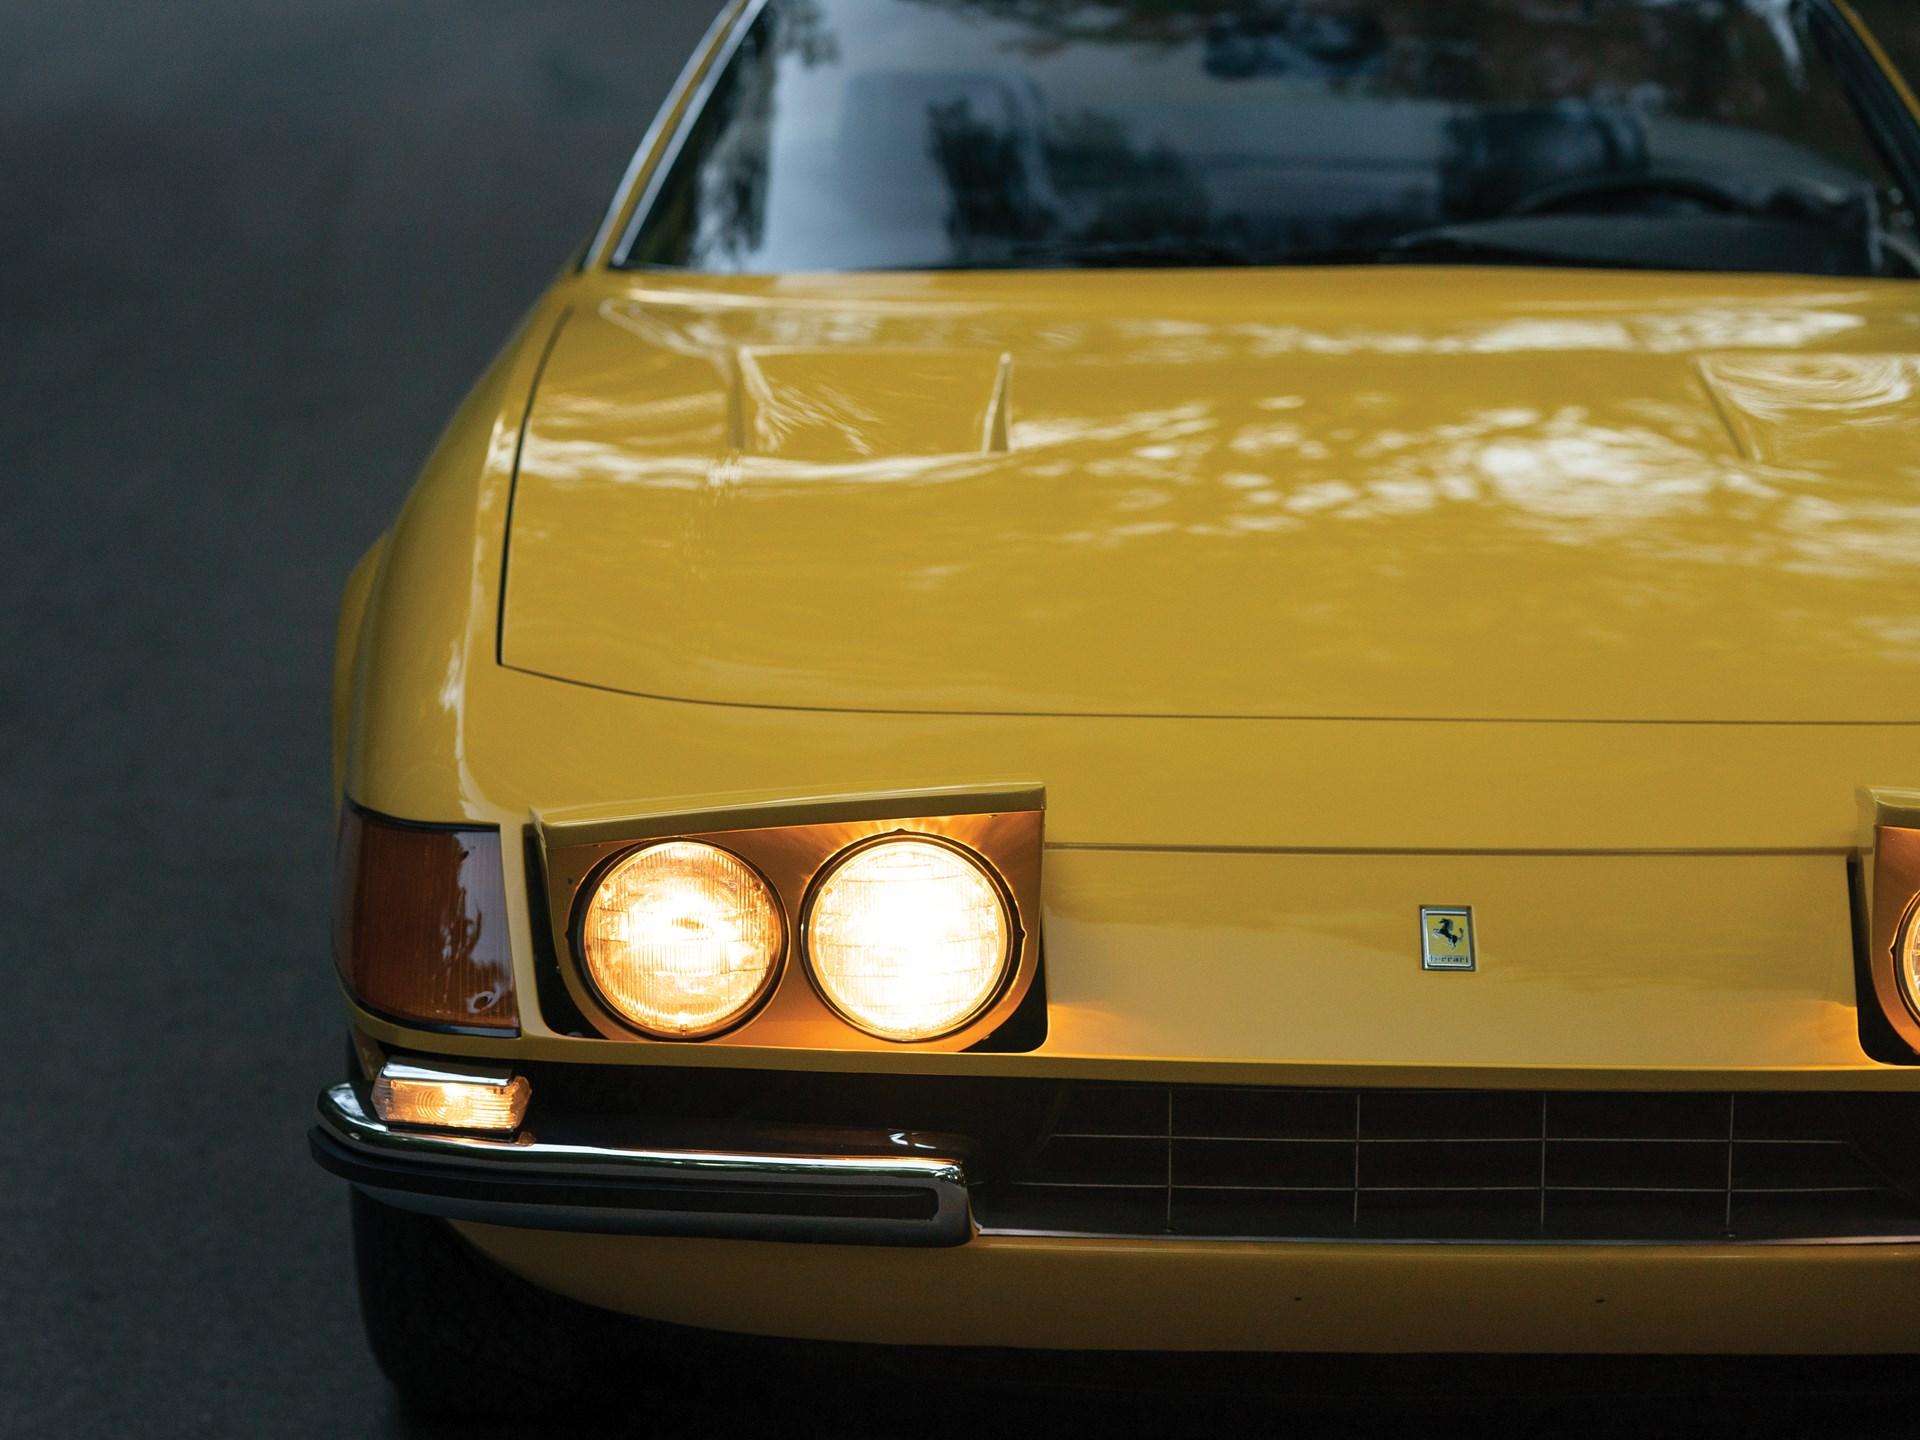 1973 Ferrari 365 GTS/4 Daytona Spider by Scaglietti